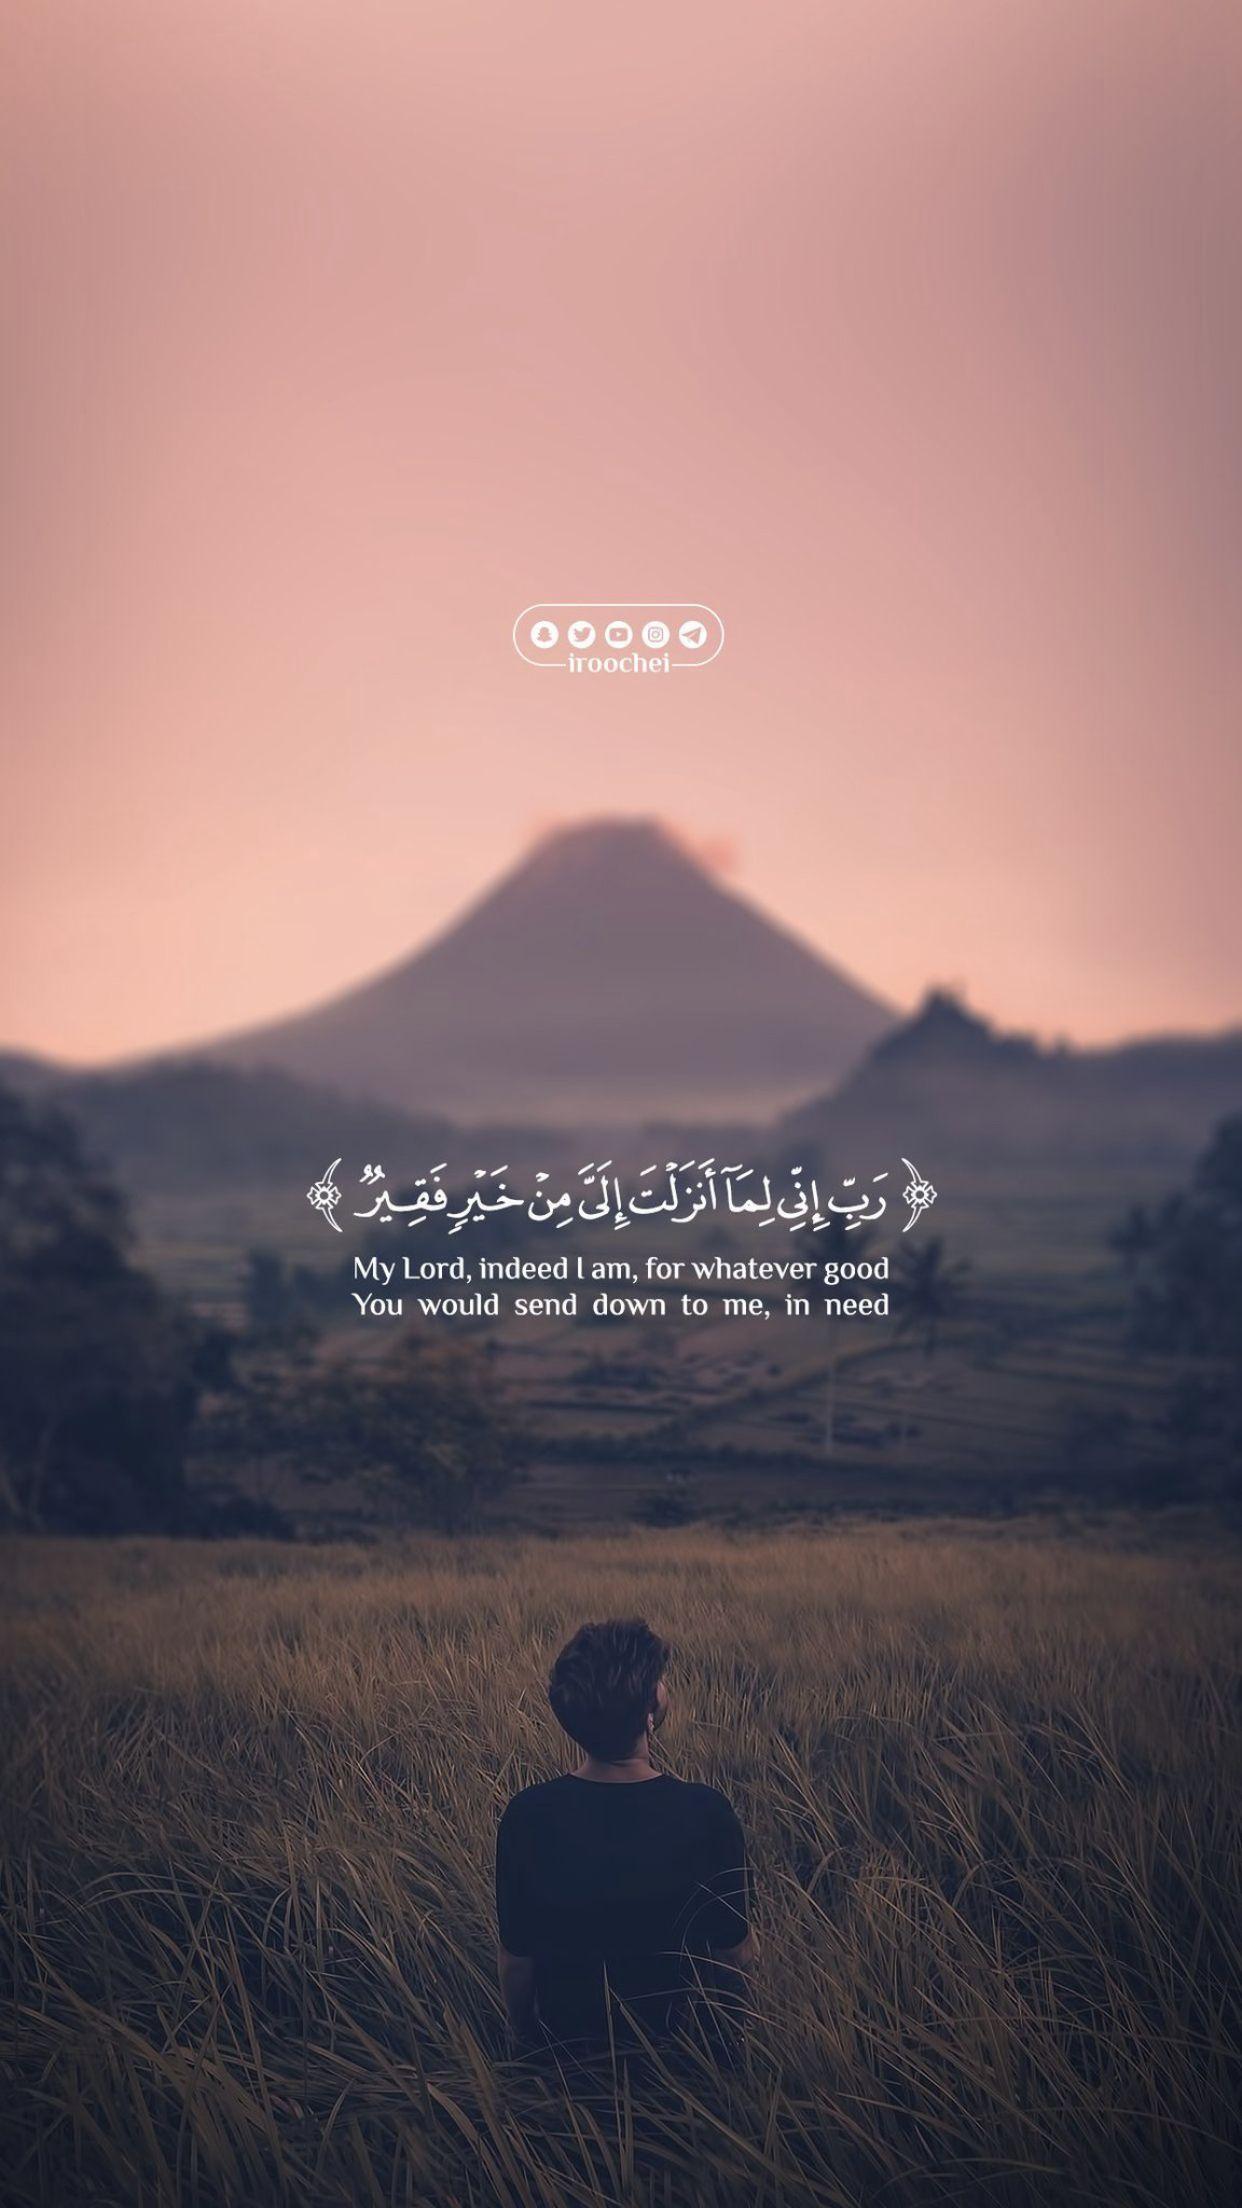 Pin by RADWA El-TANTAWY on Quran  Quran quotes love, Quran quotes